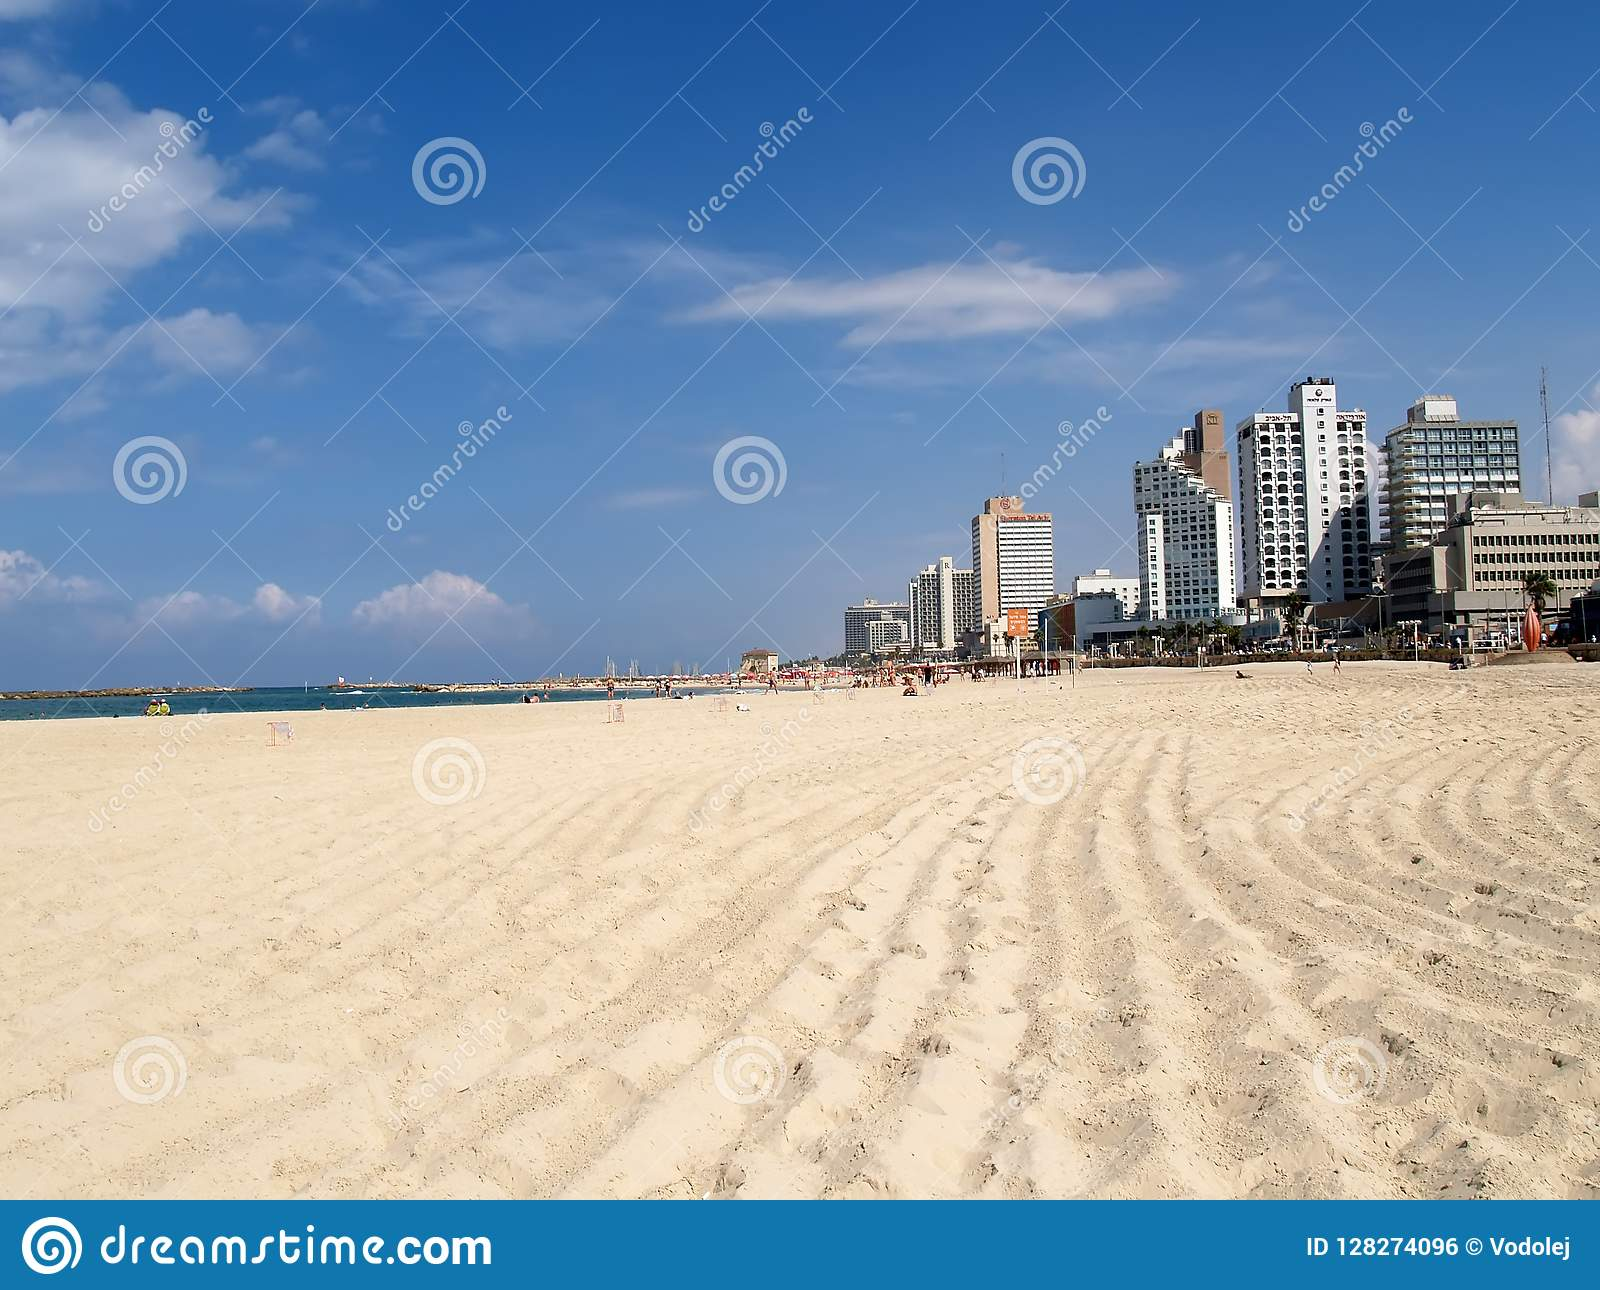 TEL AVIV, ISRAEL. A view of the city beach in Tel Aviv